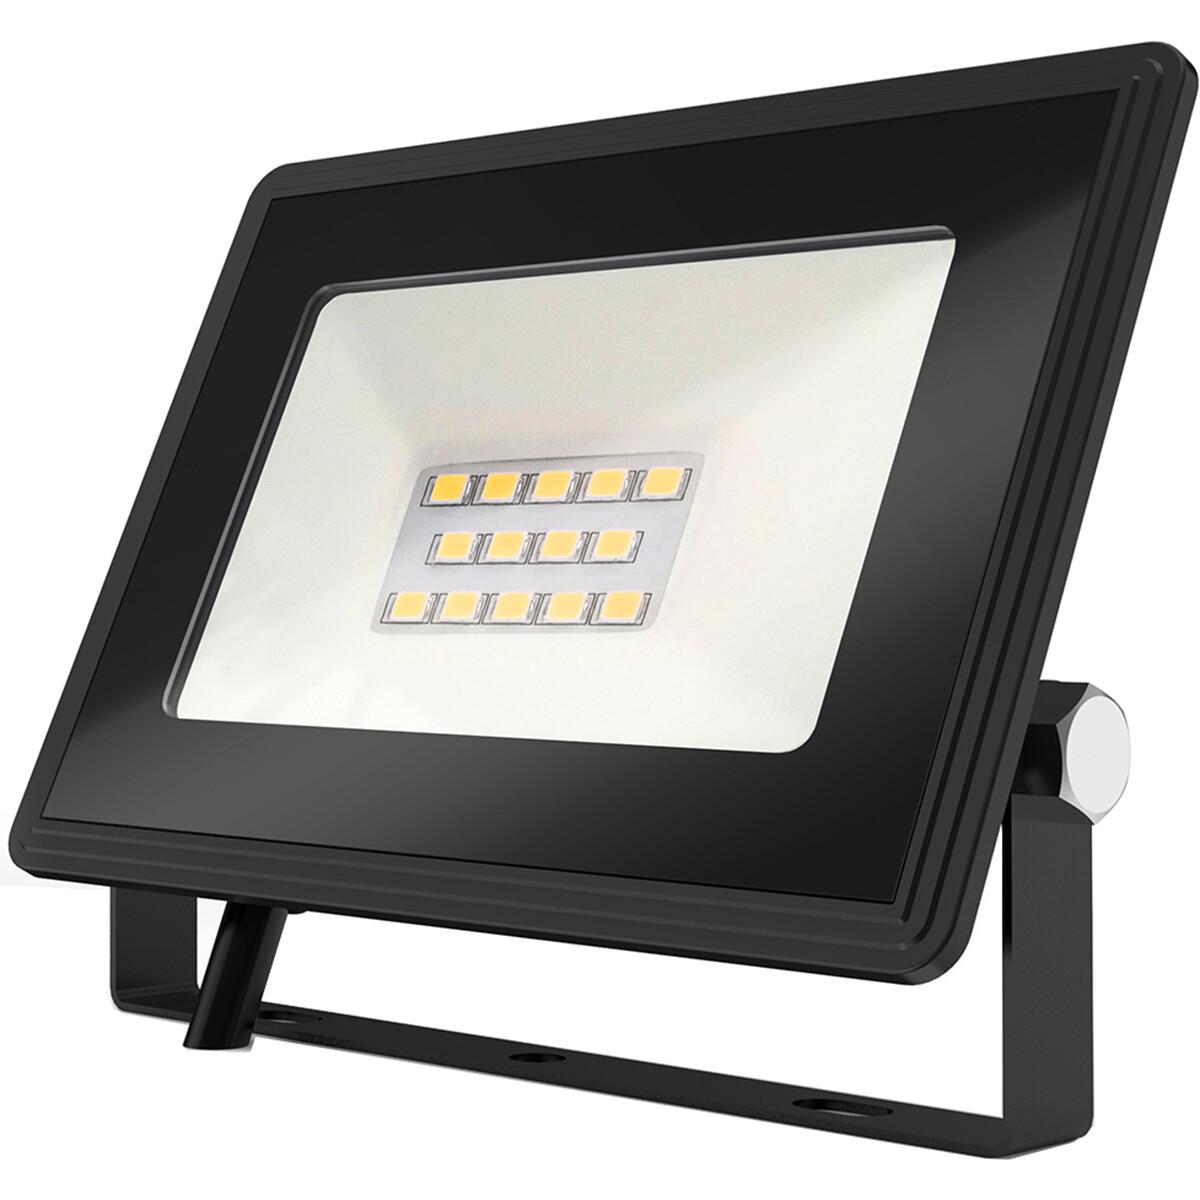 LED Bouwlamp 10 Watt - LED Schijnwerper - Aigi Iglo - Natuurlijk Wit 4000K - Waterdicht IP65 - Mat Zwart - Aluminium